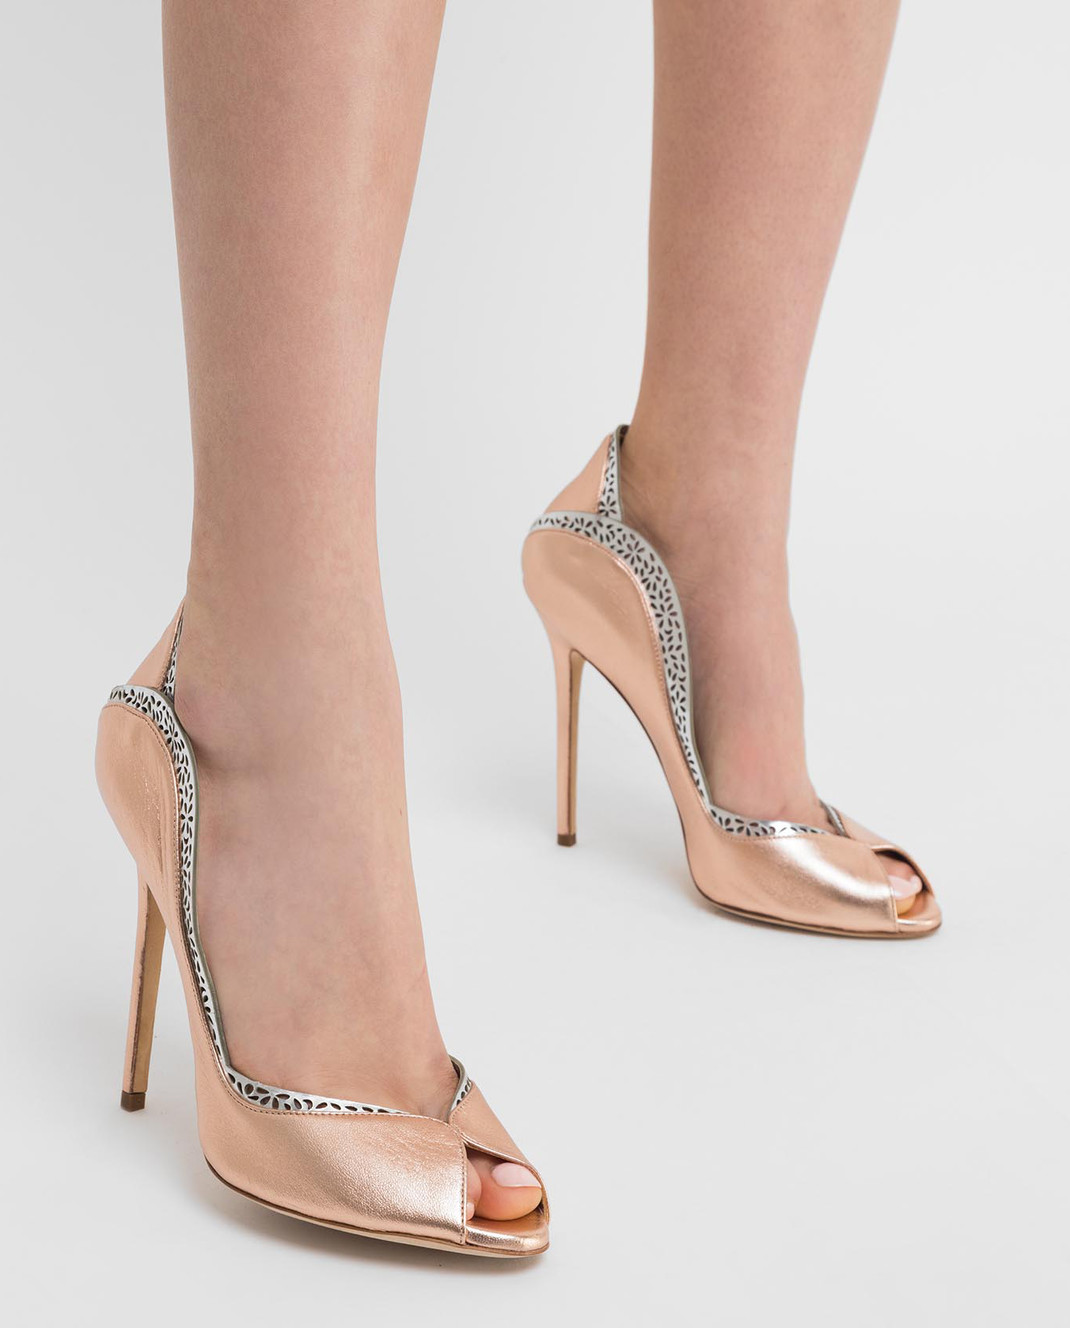 Cerasella Кожаные туфли DANAESPECCHIO изображение 2